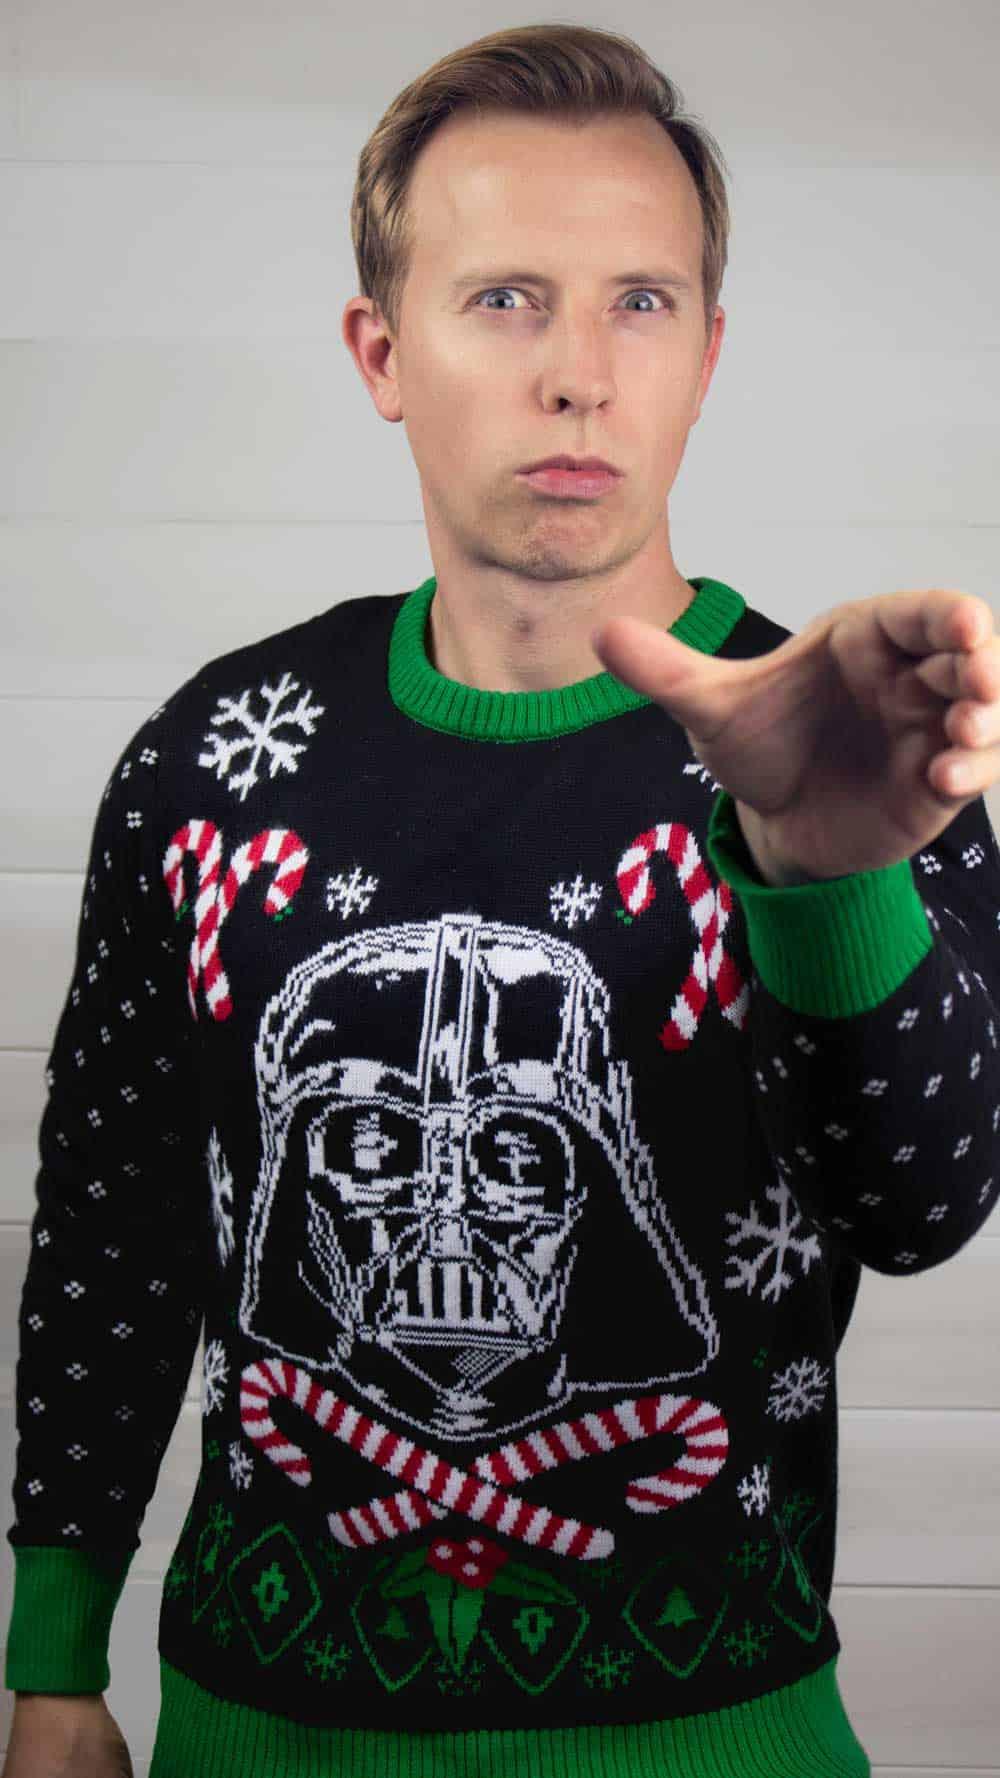 Star Wars Darth Vader ugly Christmas sweater